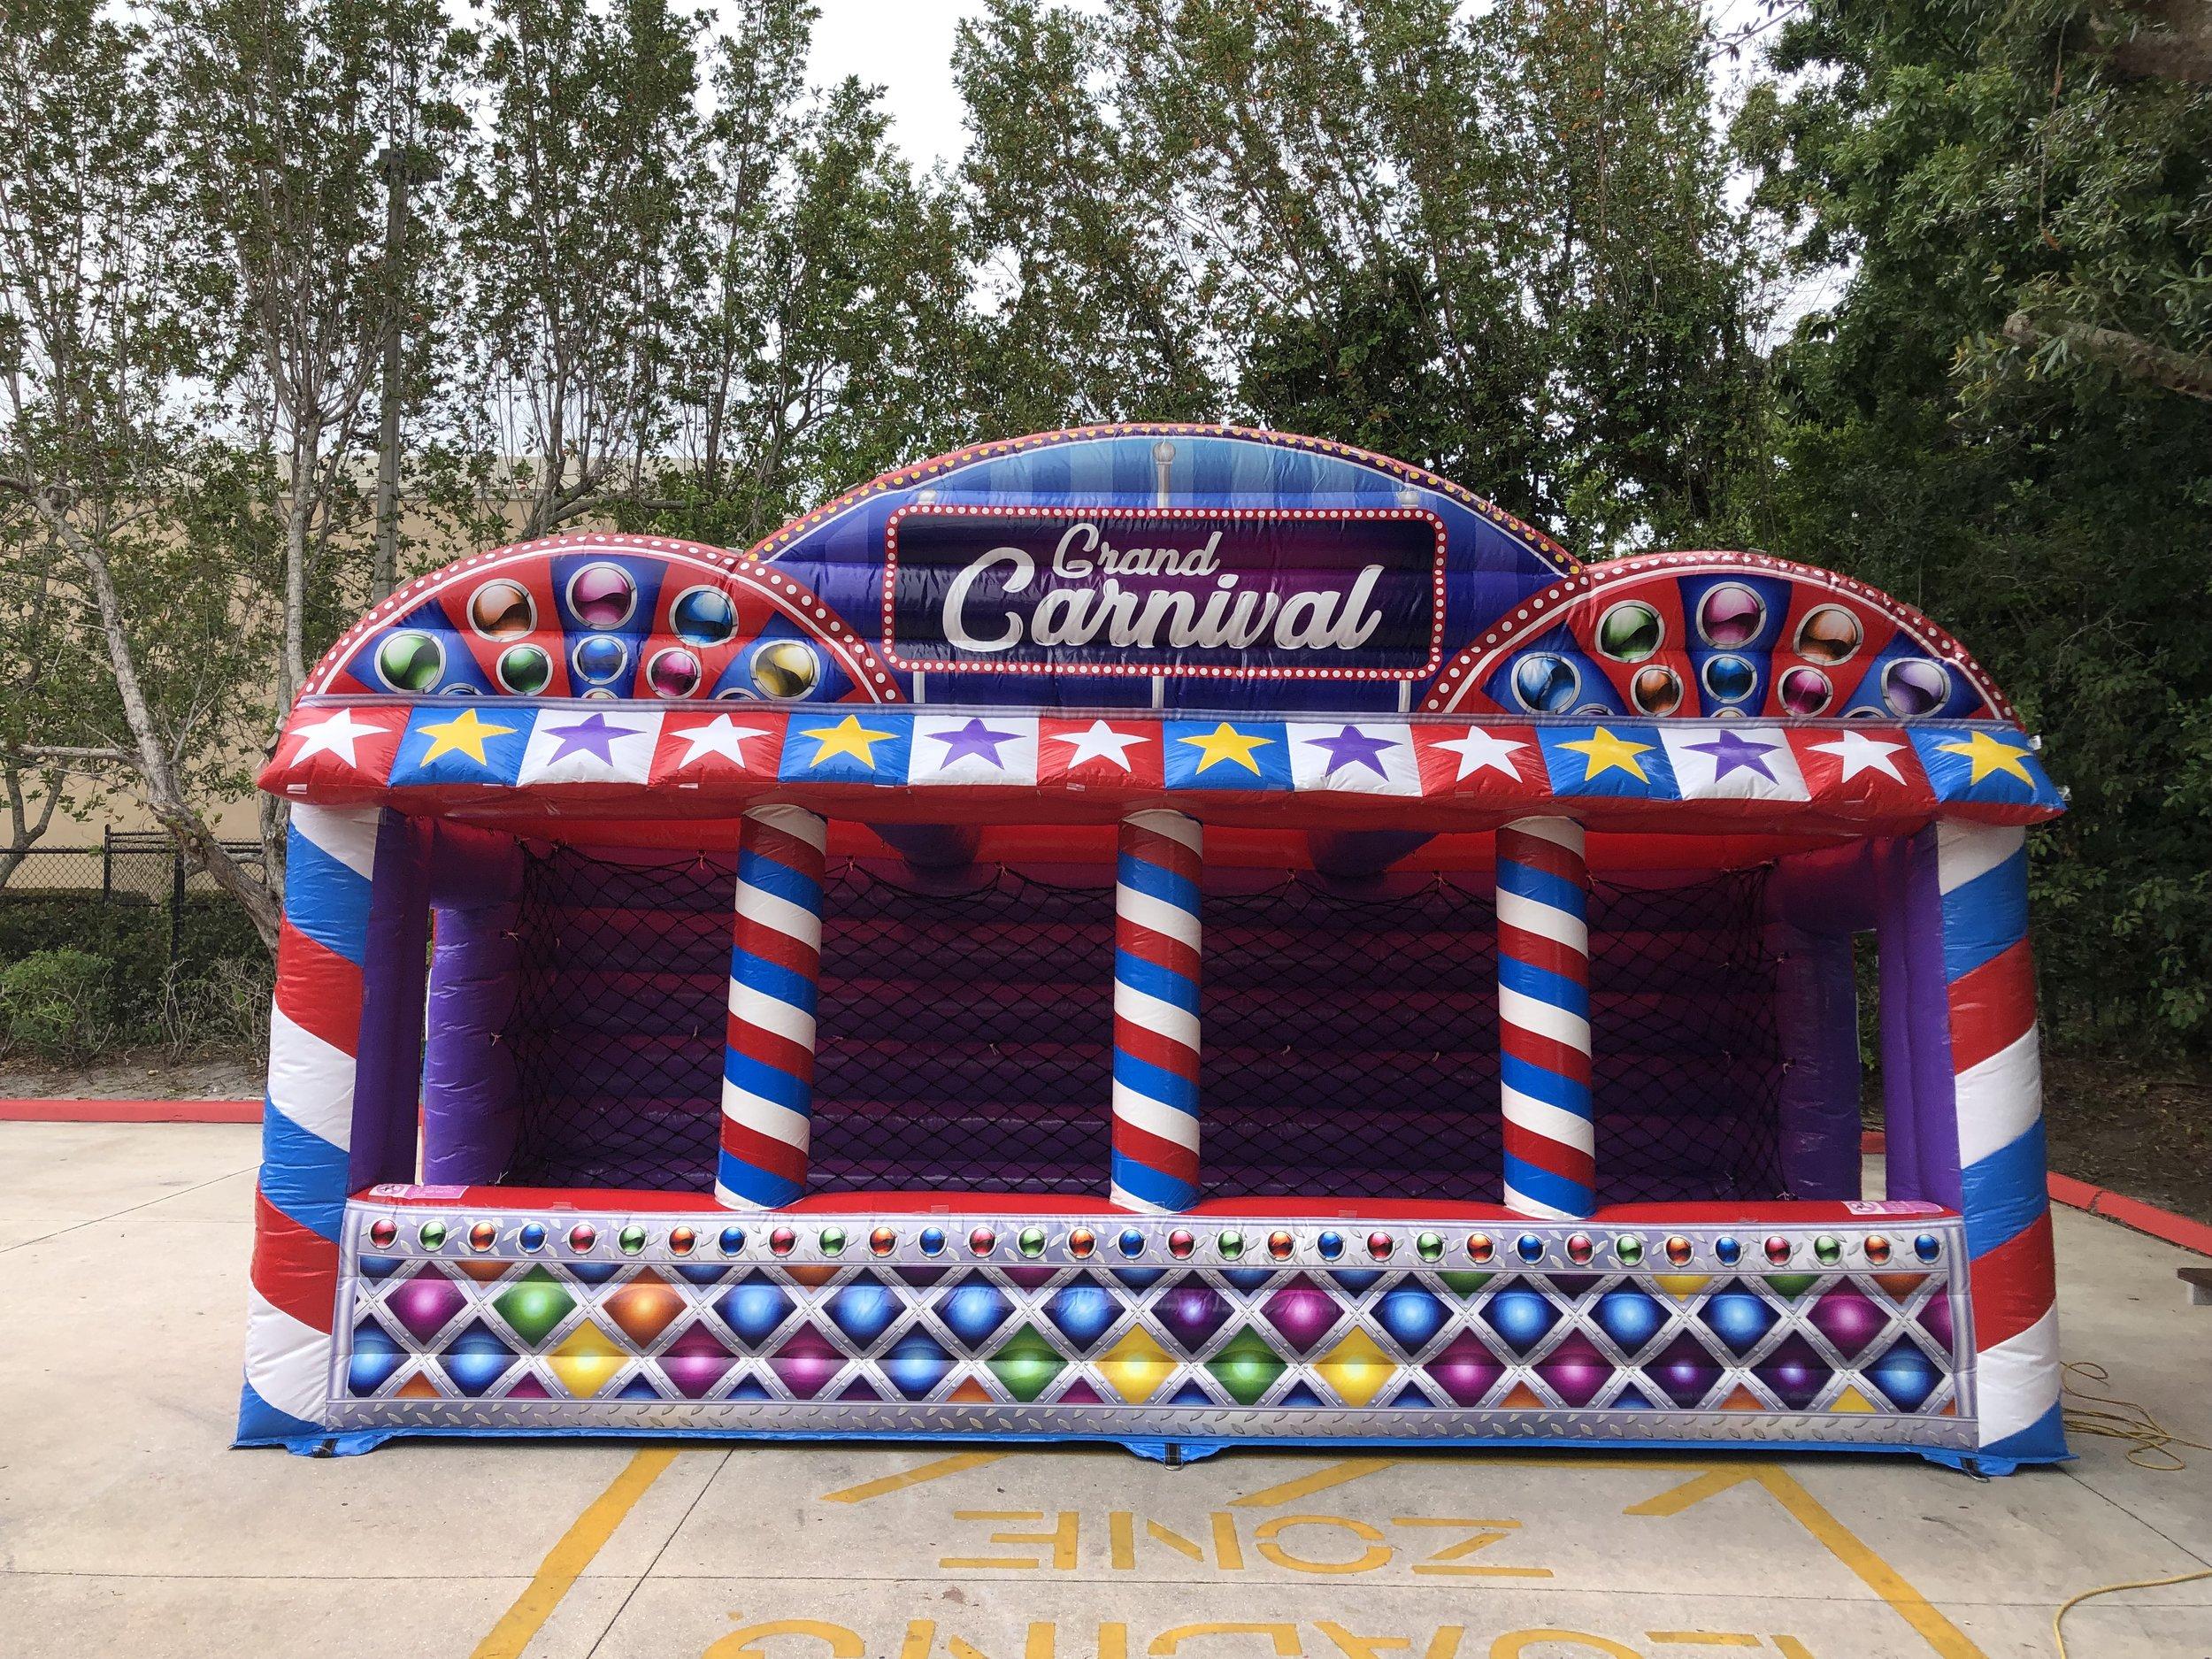 grandmidway-carnivalgame-inflatable-partyrentalsupplies-royalpalmbeach.jpg